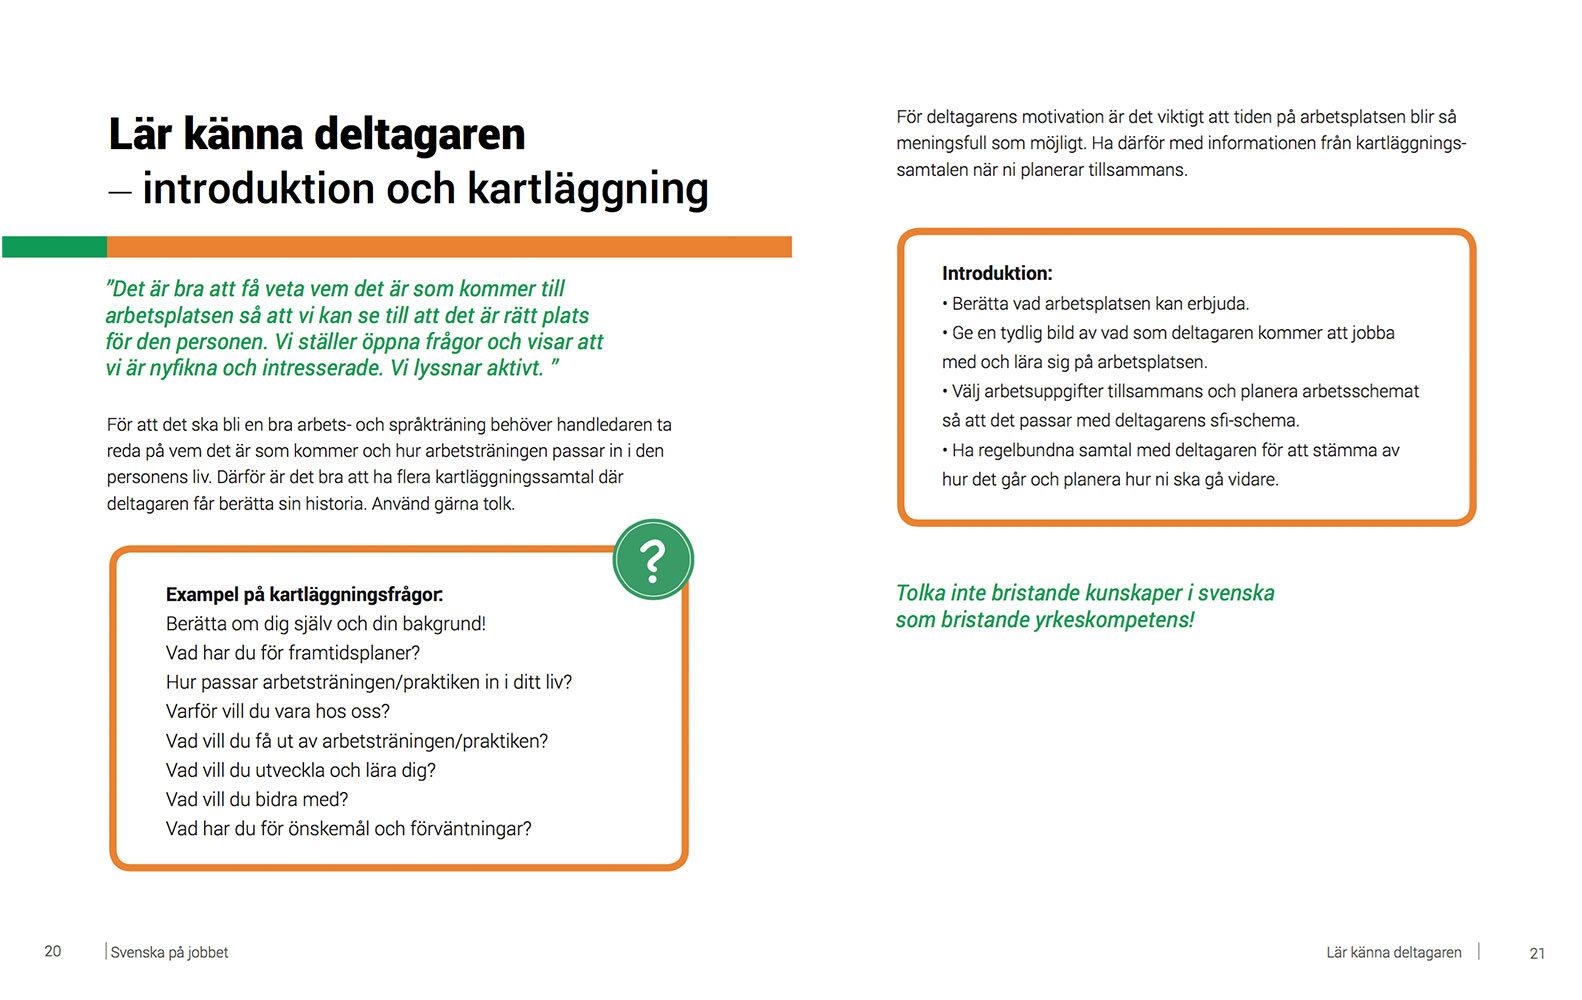 FS_Svenska-pa-jobbet_04.jpg